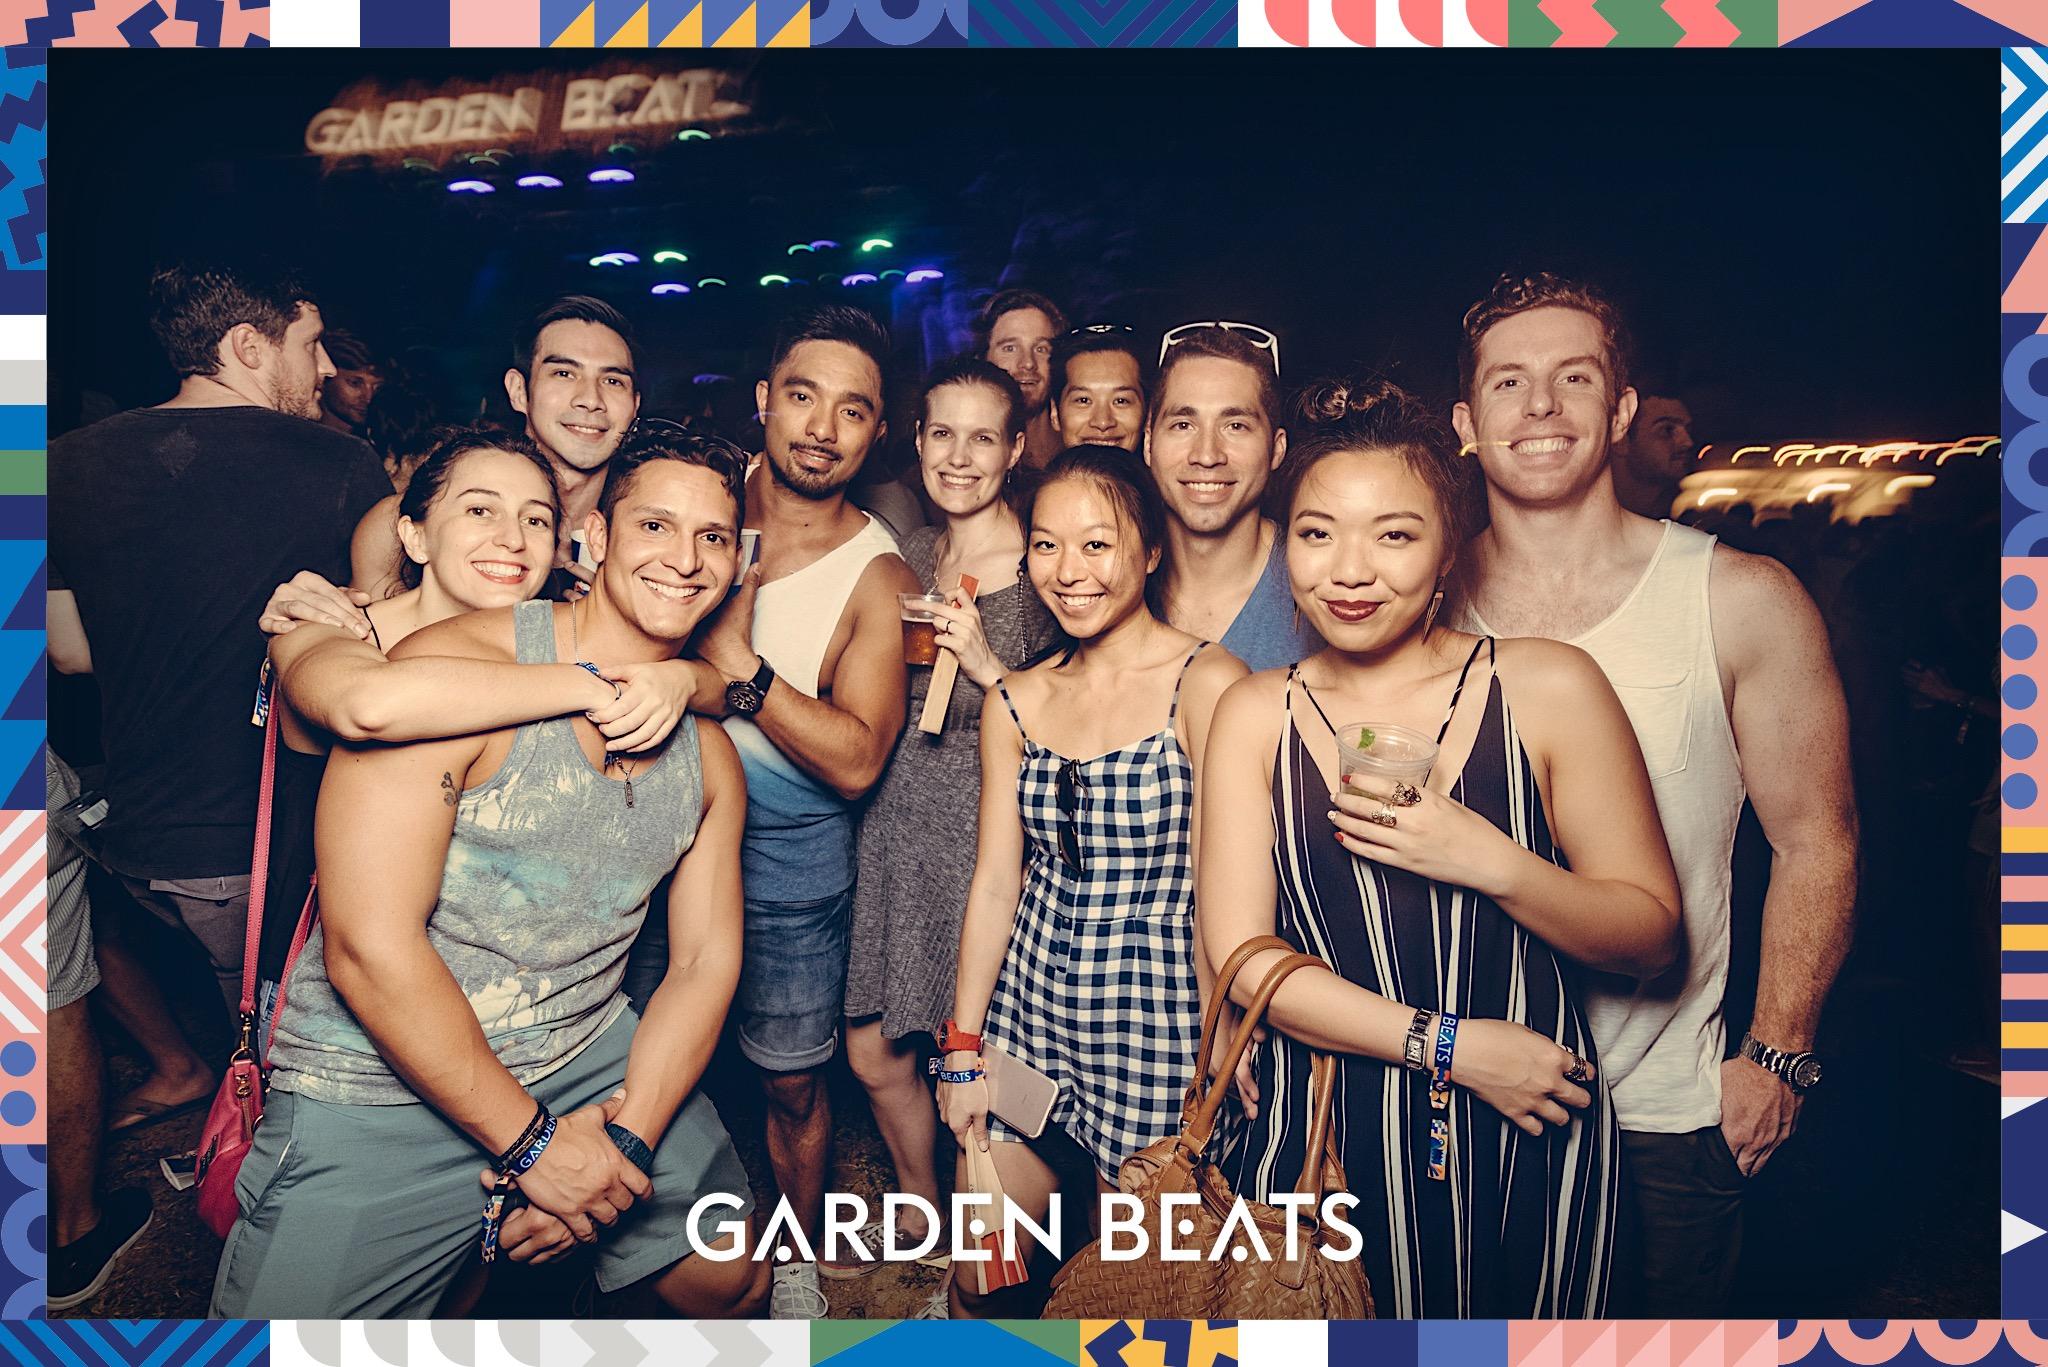 18032017_GardenBeats_Colossal749_WatermarkedGB.jpg